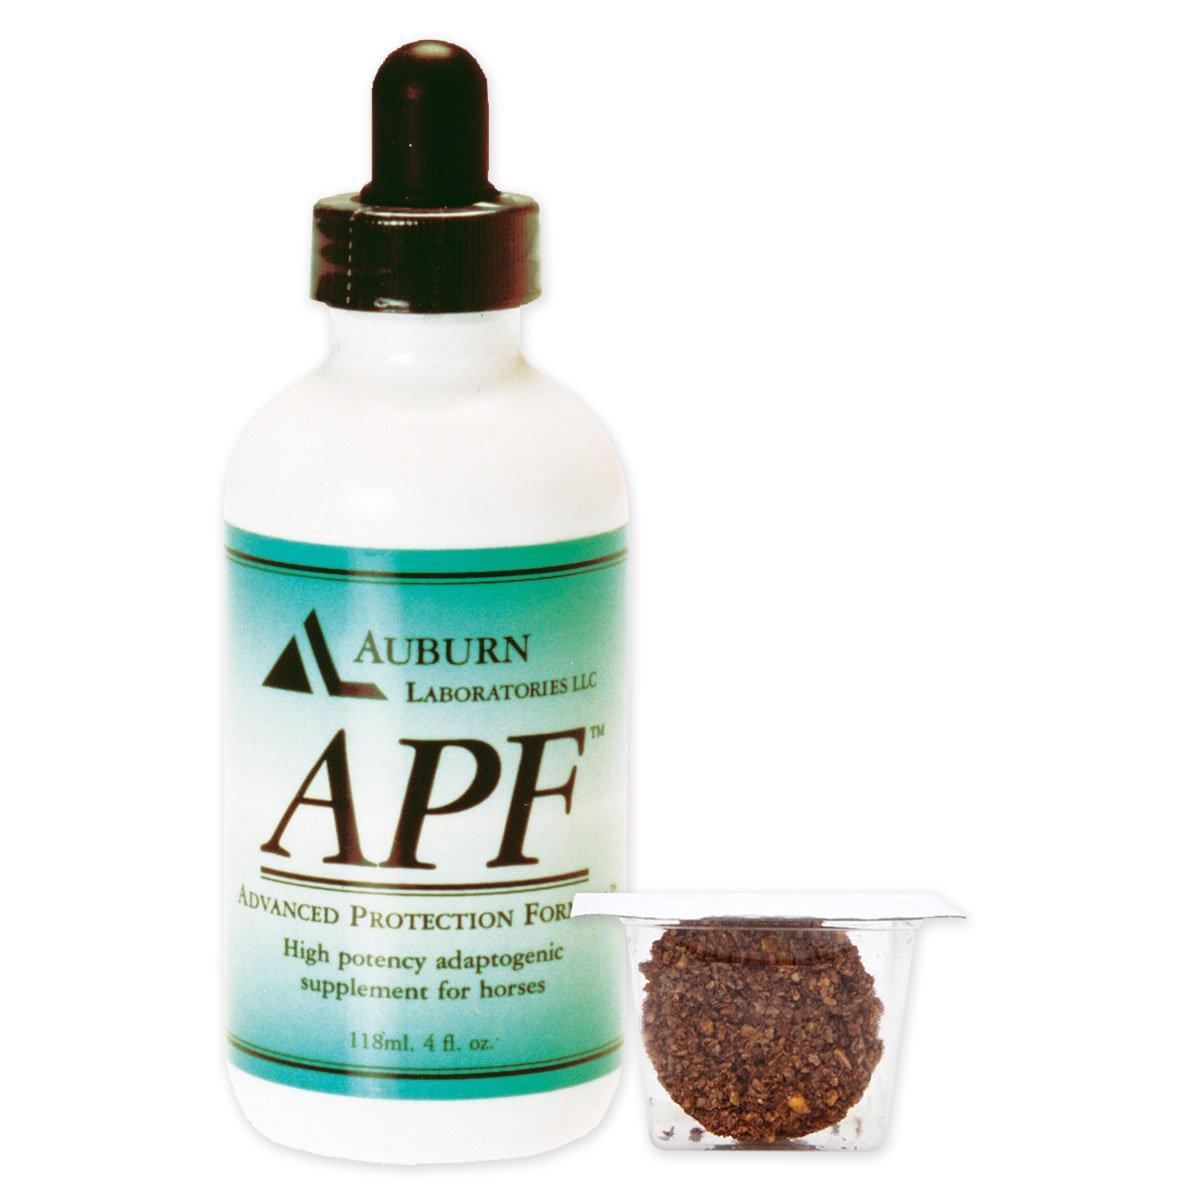 APF Advanced Protection Formula (4oz) by Auburn Laboratories Inc.